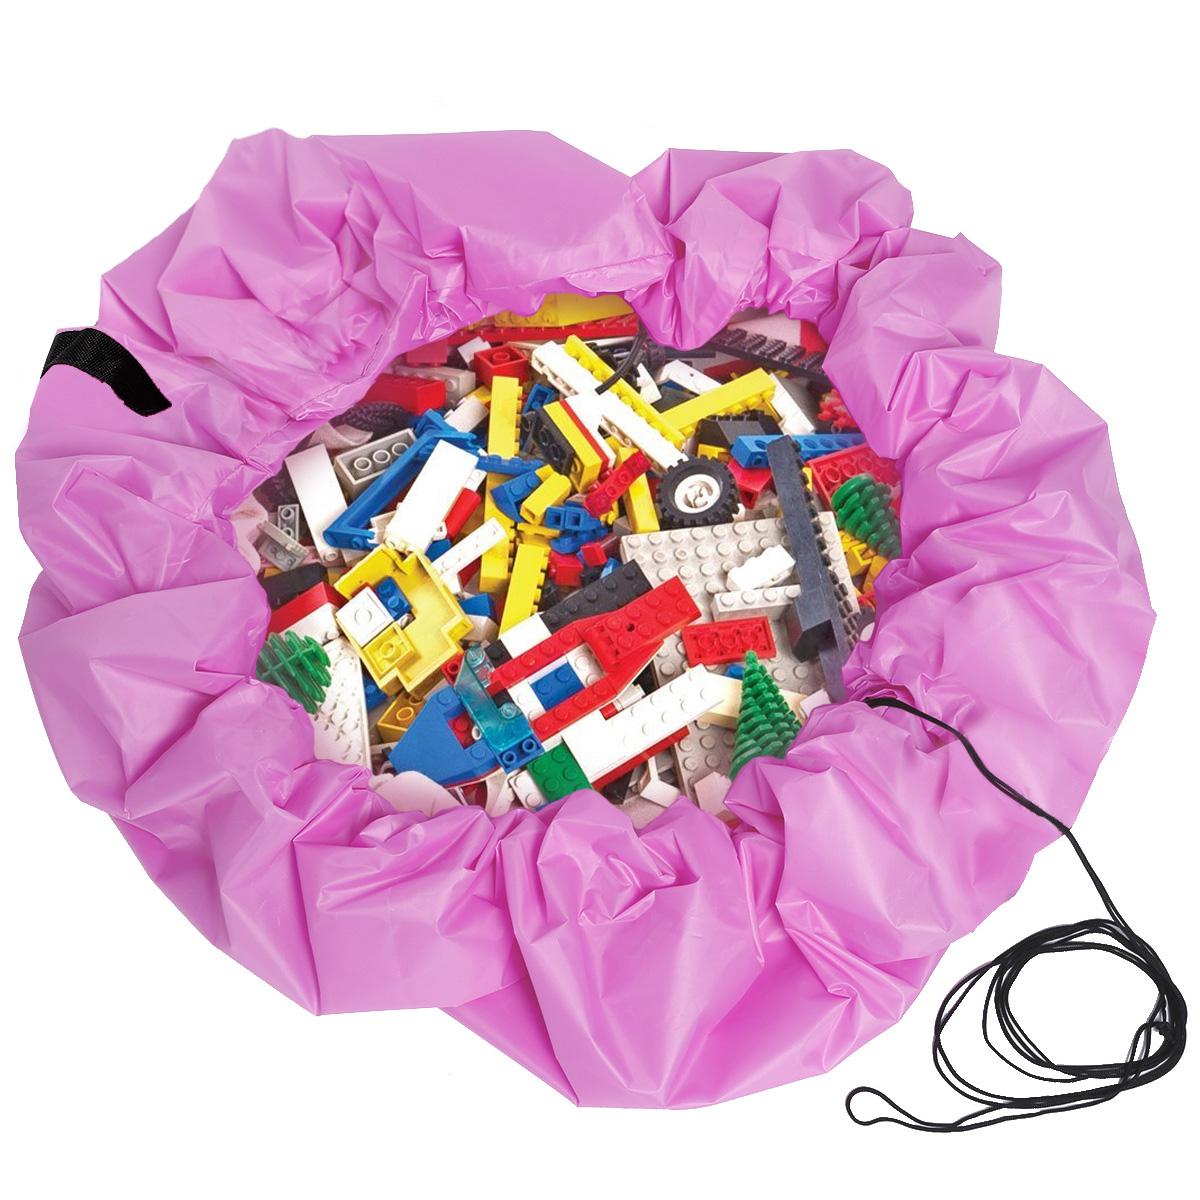 sac organisateur rangement jouet enfant stockage tapis jeu pochette rapide 150cm ebay. Black Bedroom Furniture Sets. Home Design Ideas